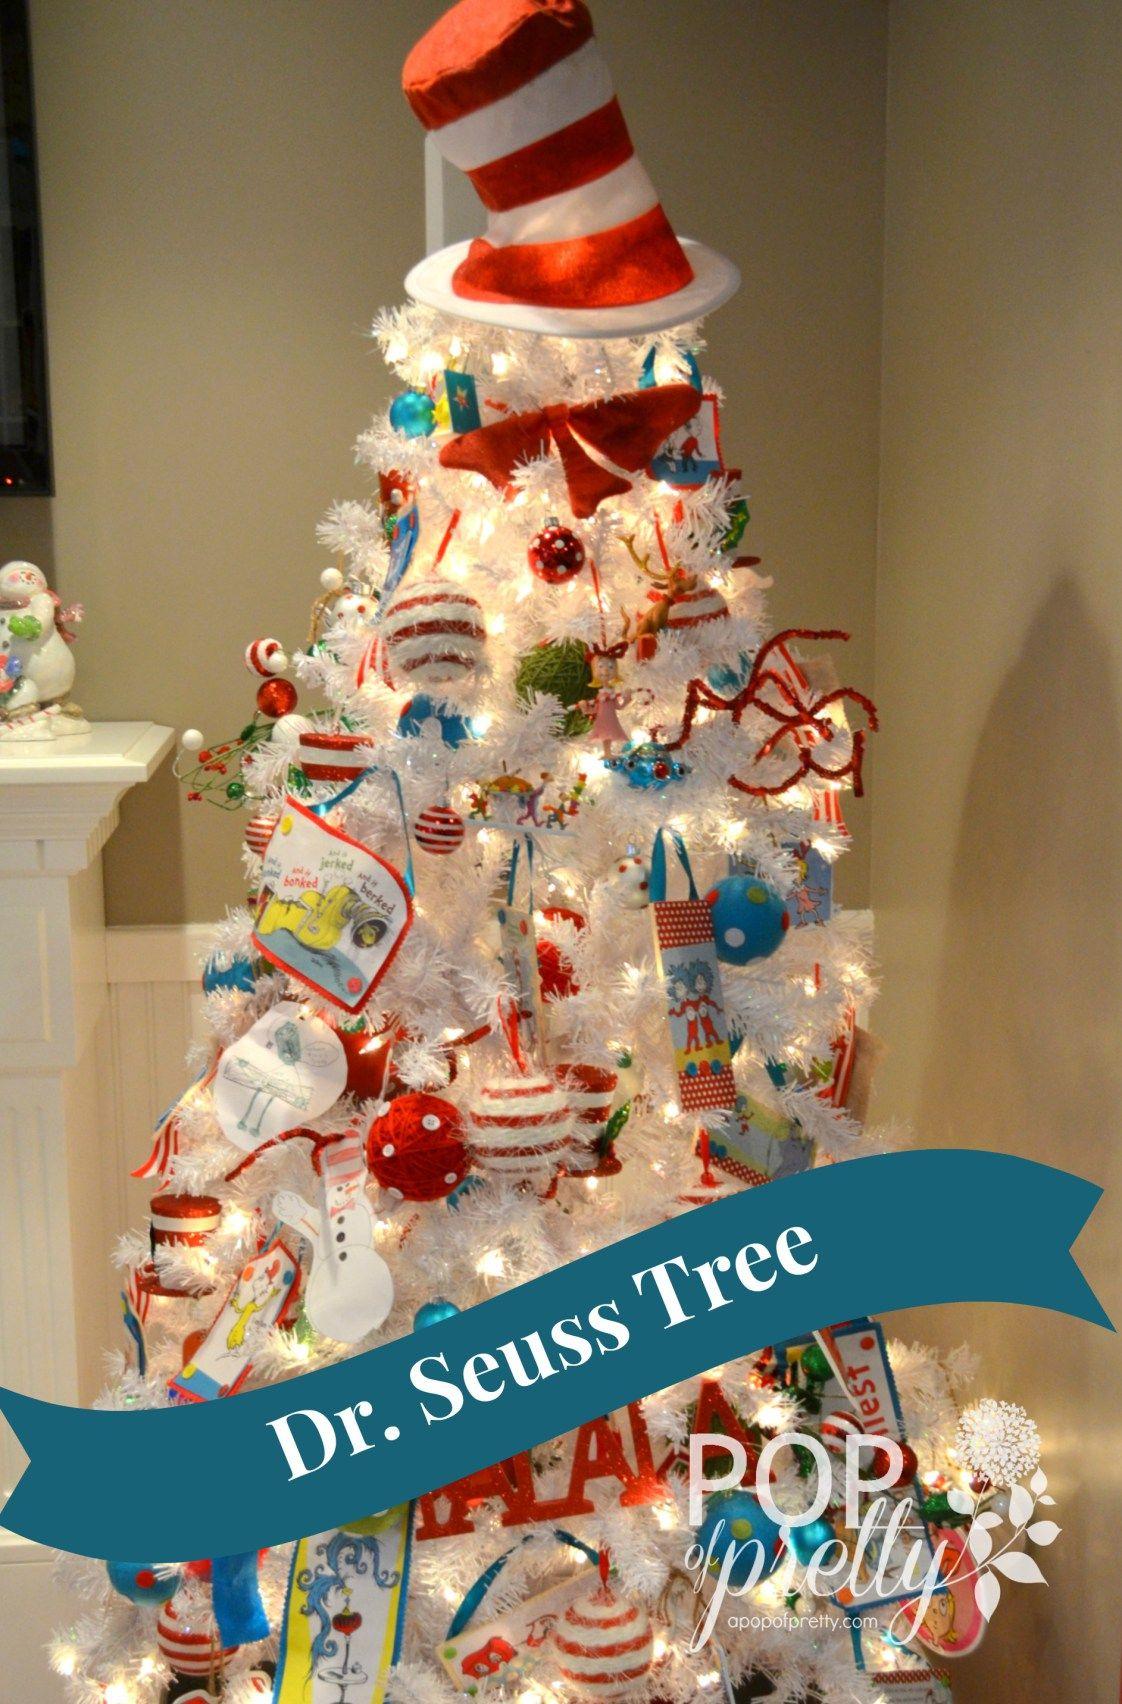 Holiday, Hoobie, Whatty? Our Dr. Seuss Christmas Tree